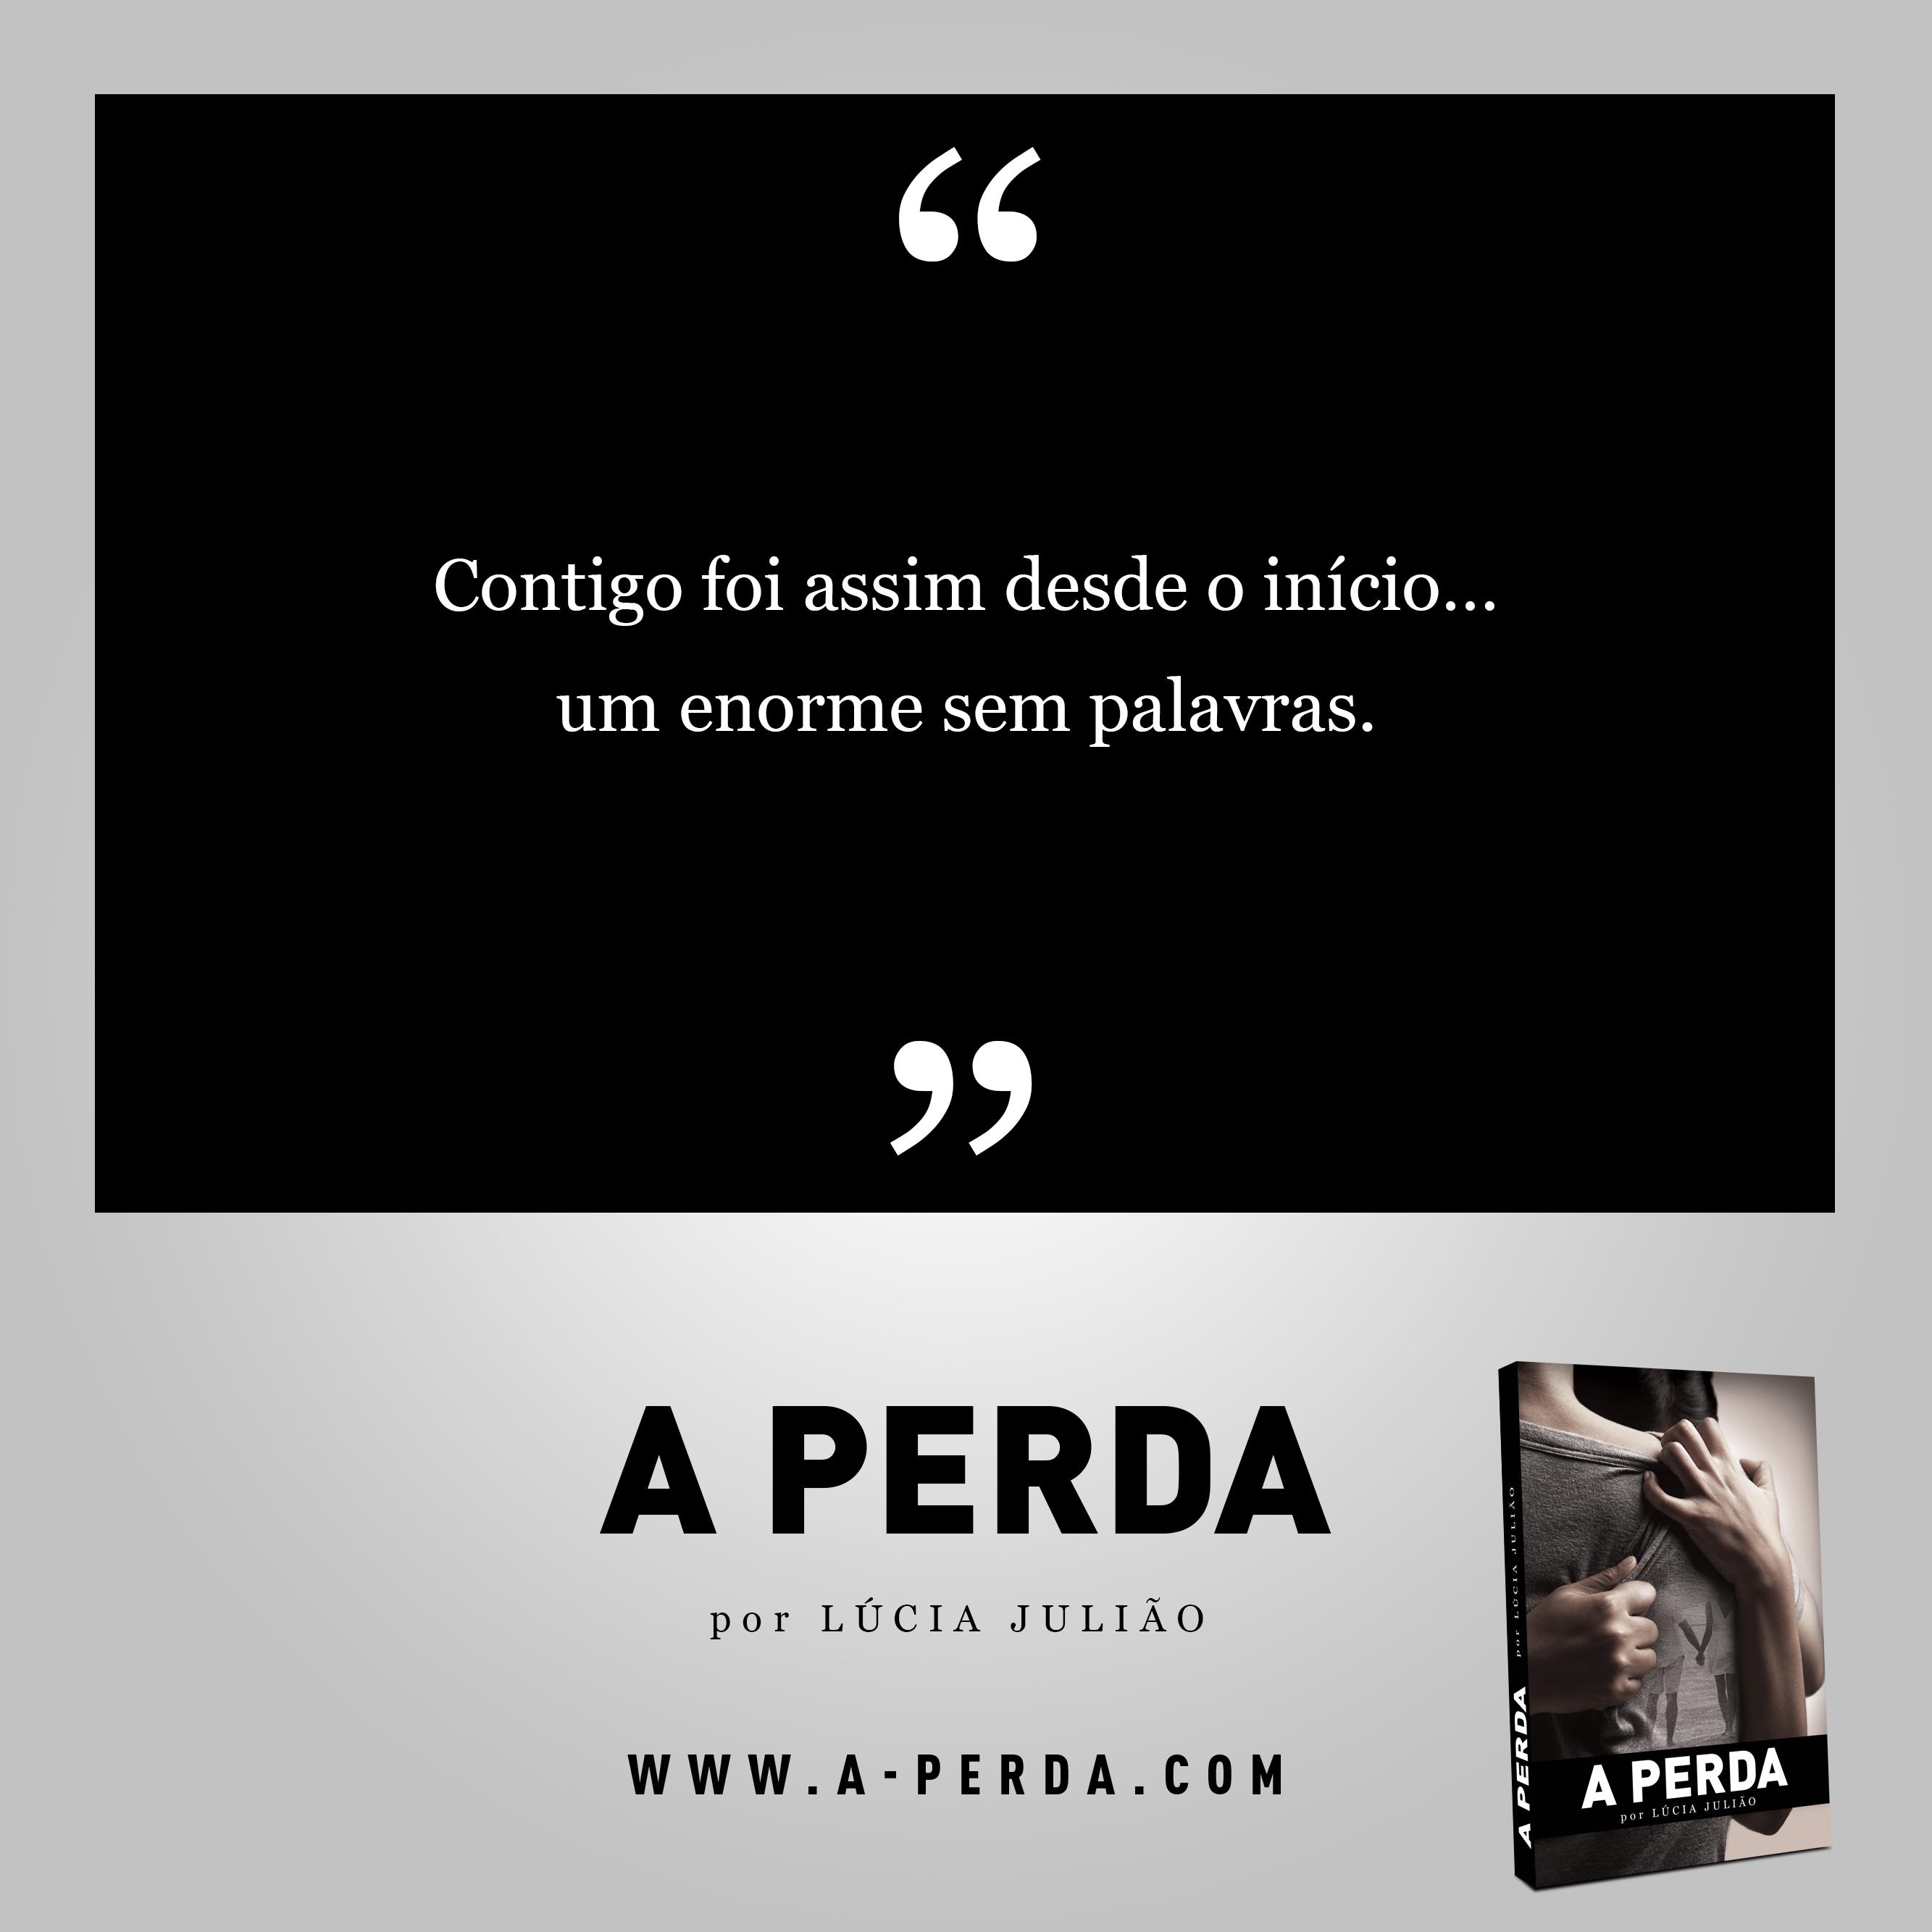 027-capitulo-7-livro-a-Perda-de-Lucia-Juliao-Instagram